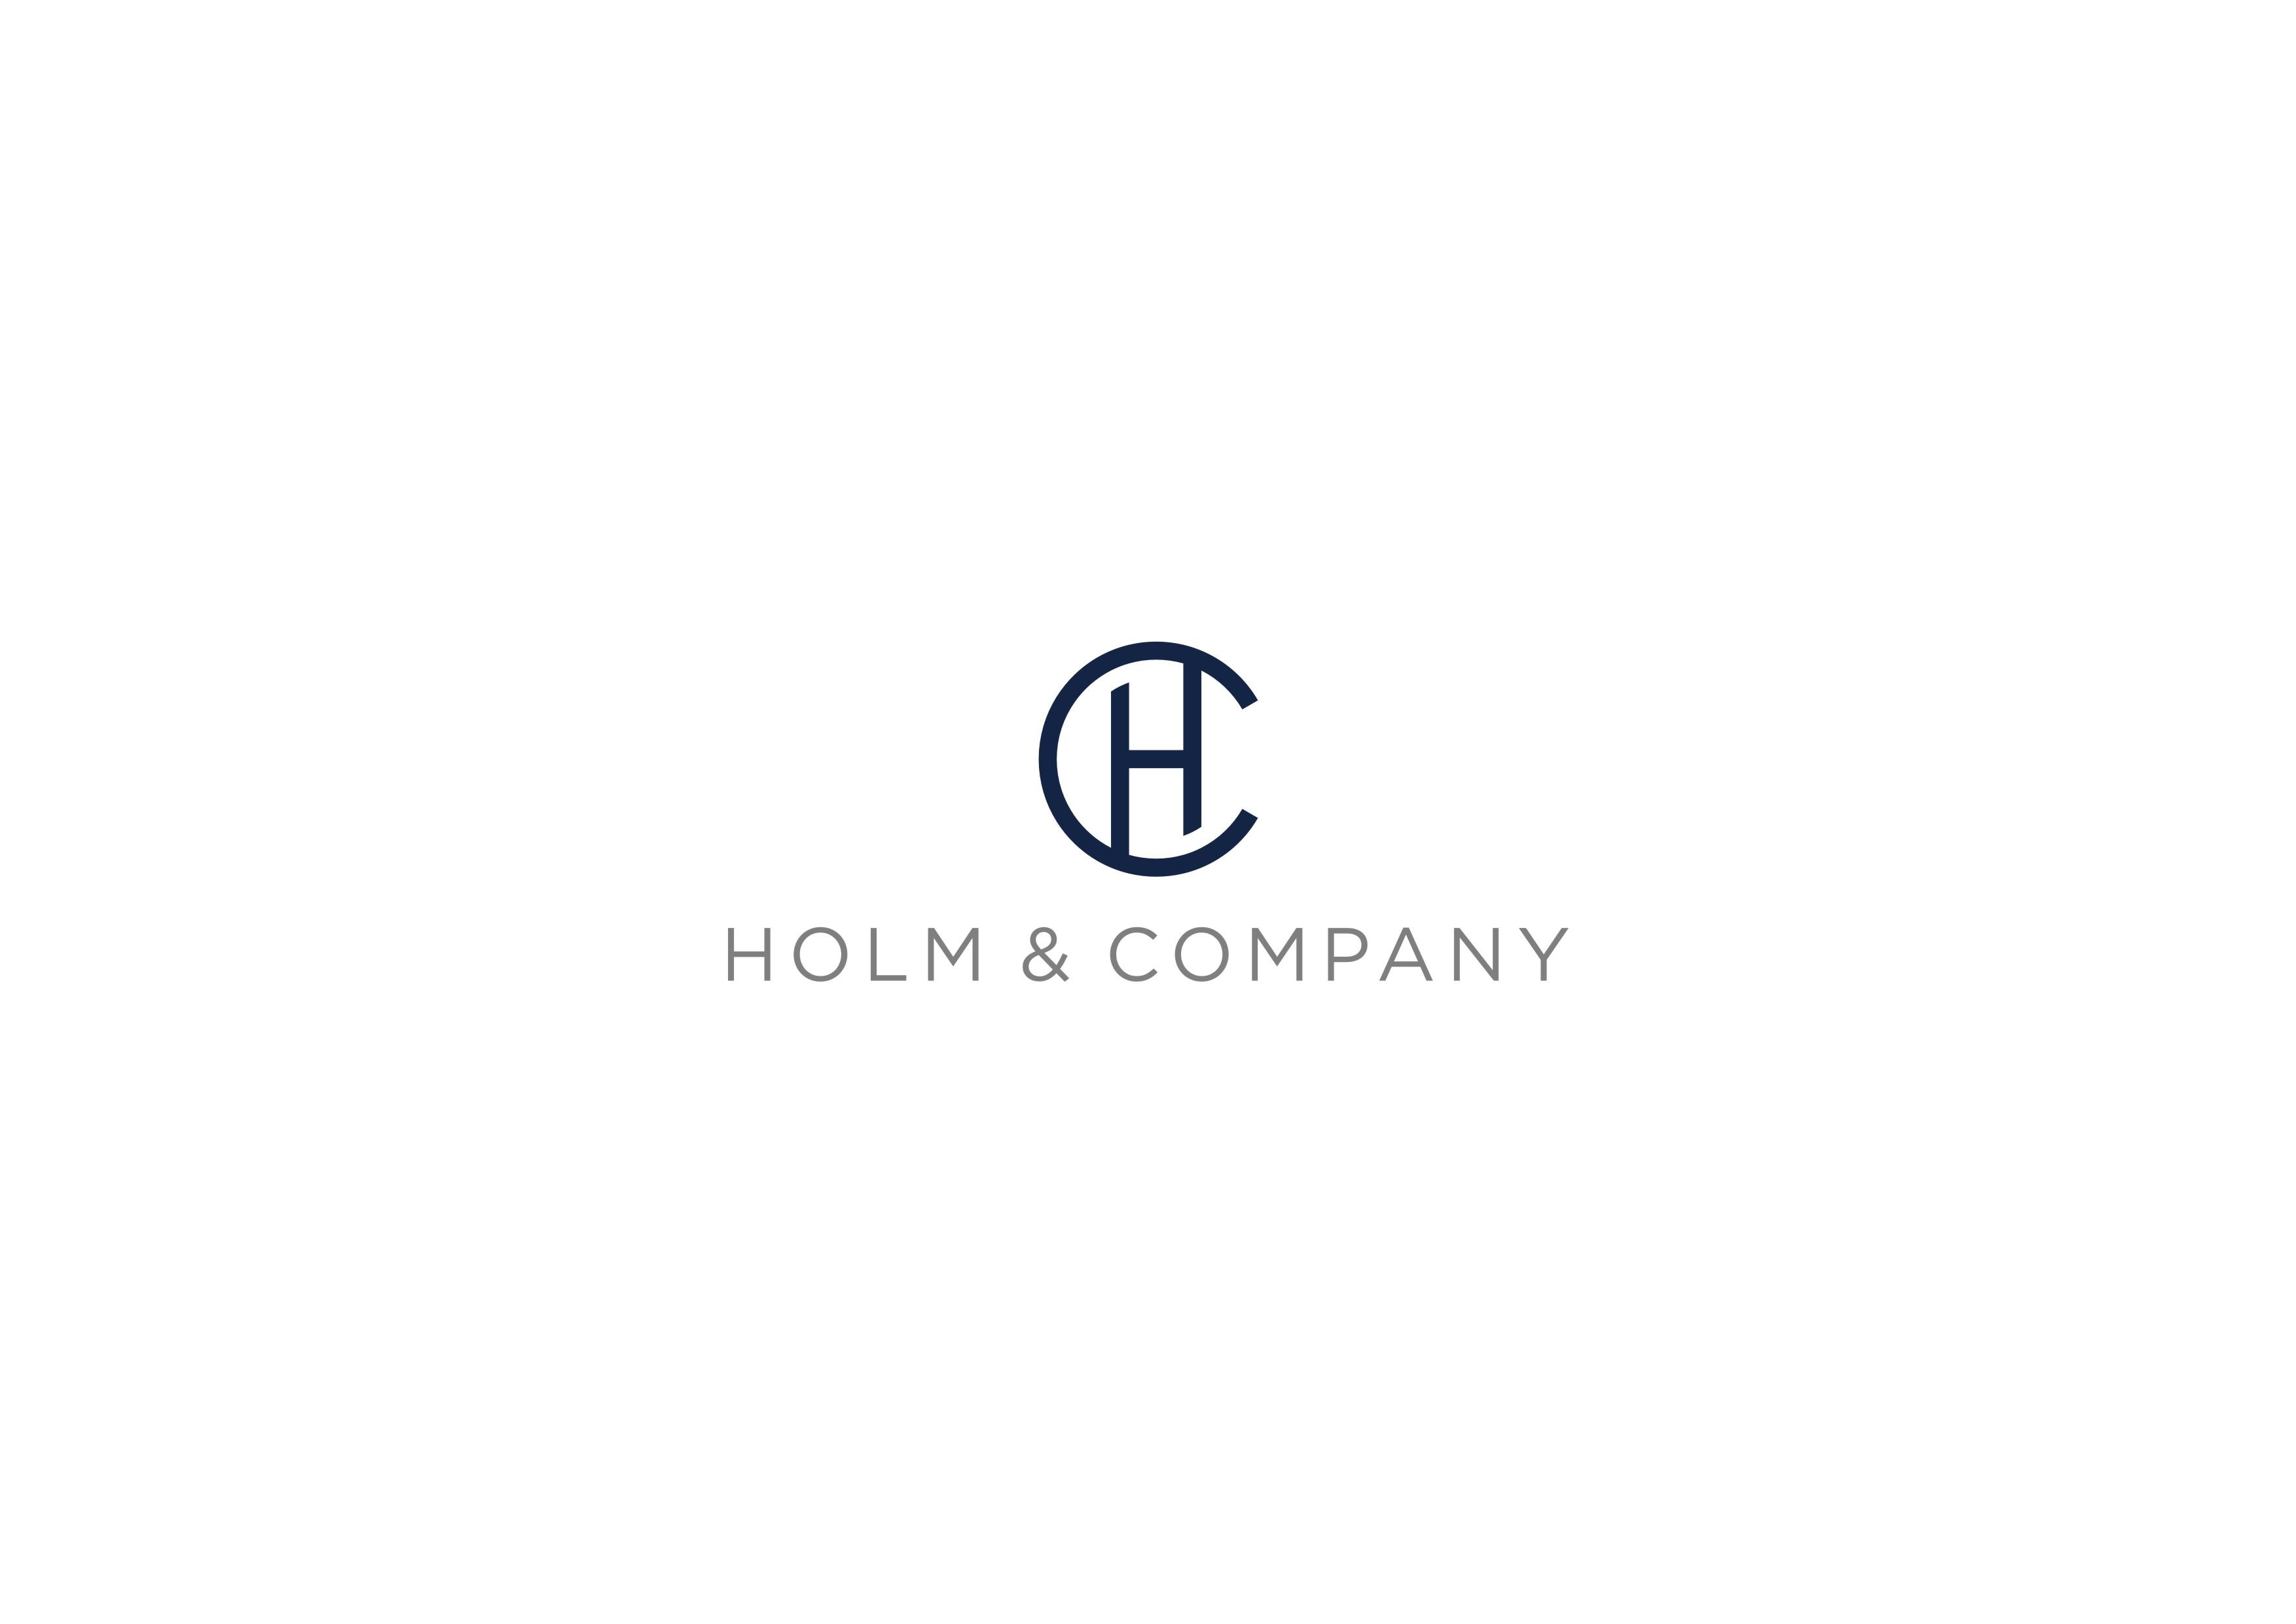 Holm & Company